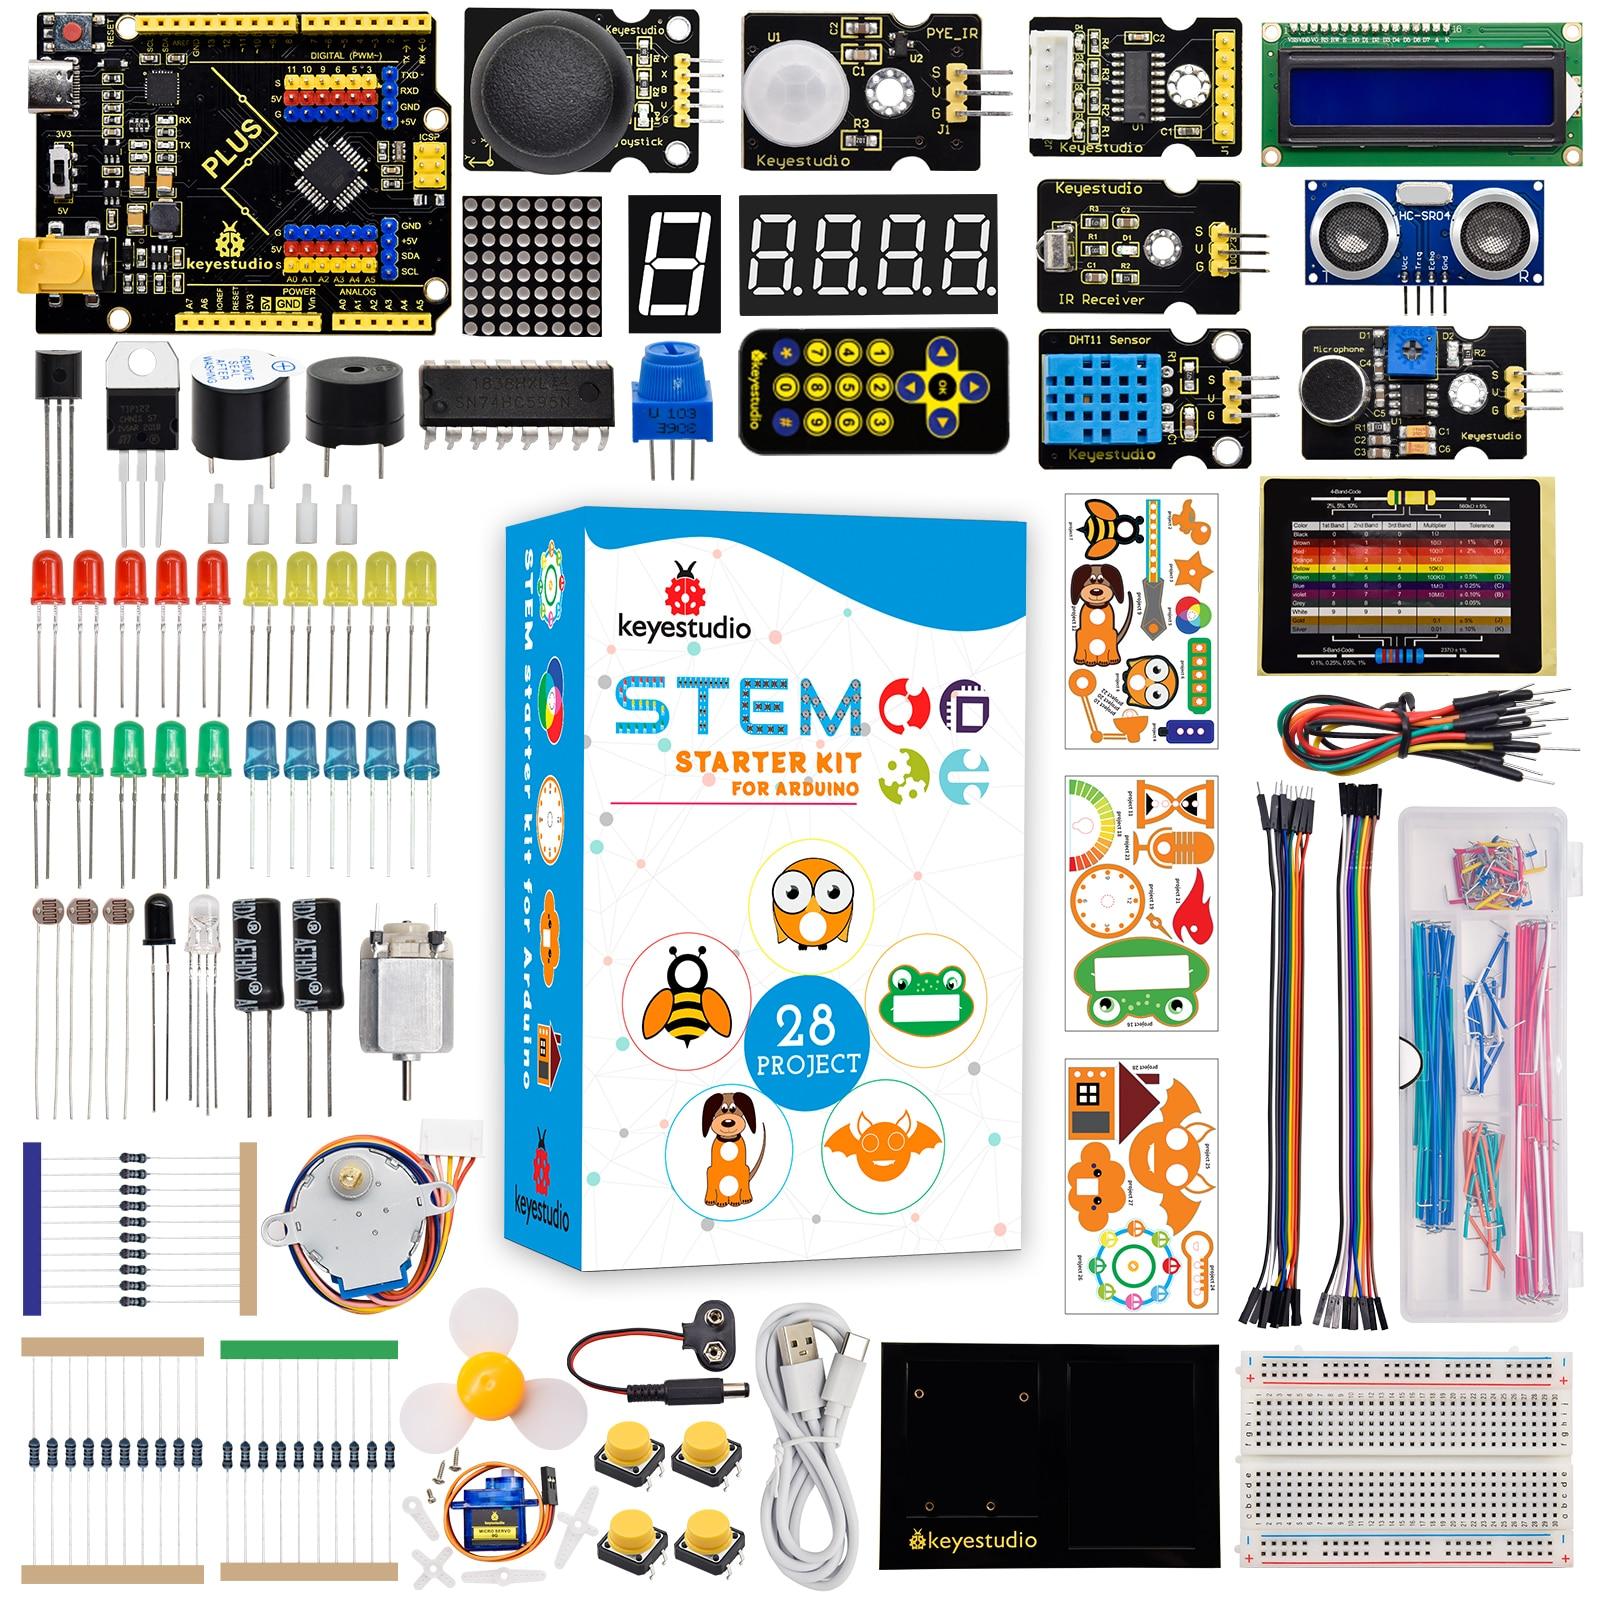 Keyestudio STEM  Plus Board Starter Kit for Arduino Starter Kit Full Set Complete Electronic DIY Projects Programming Kit brock craft arduino projects for dummies